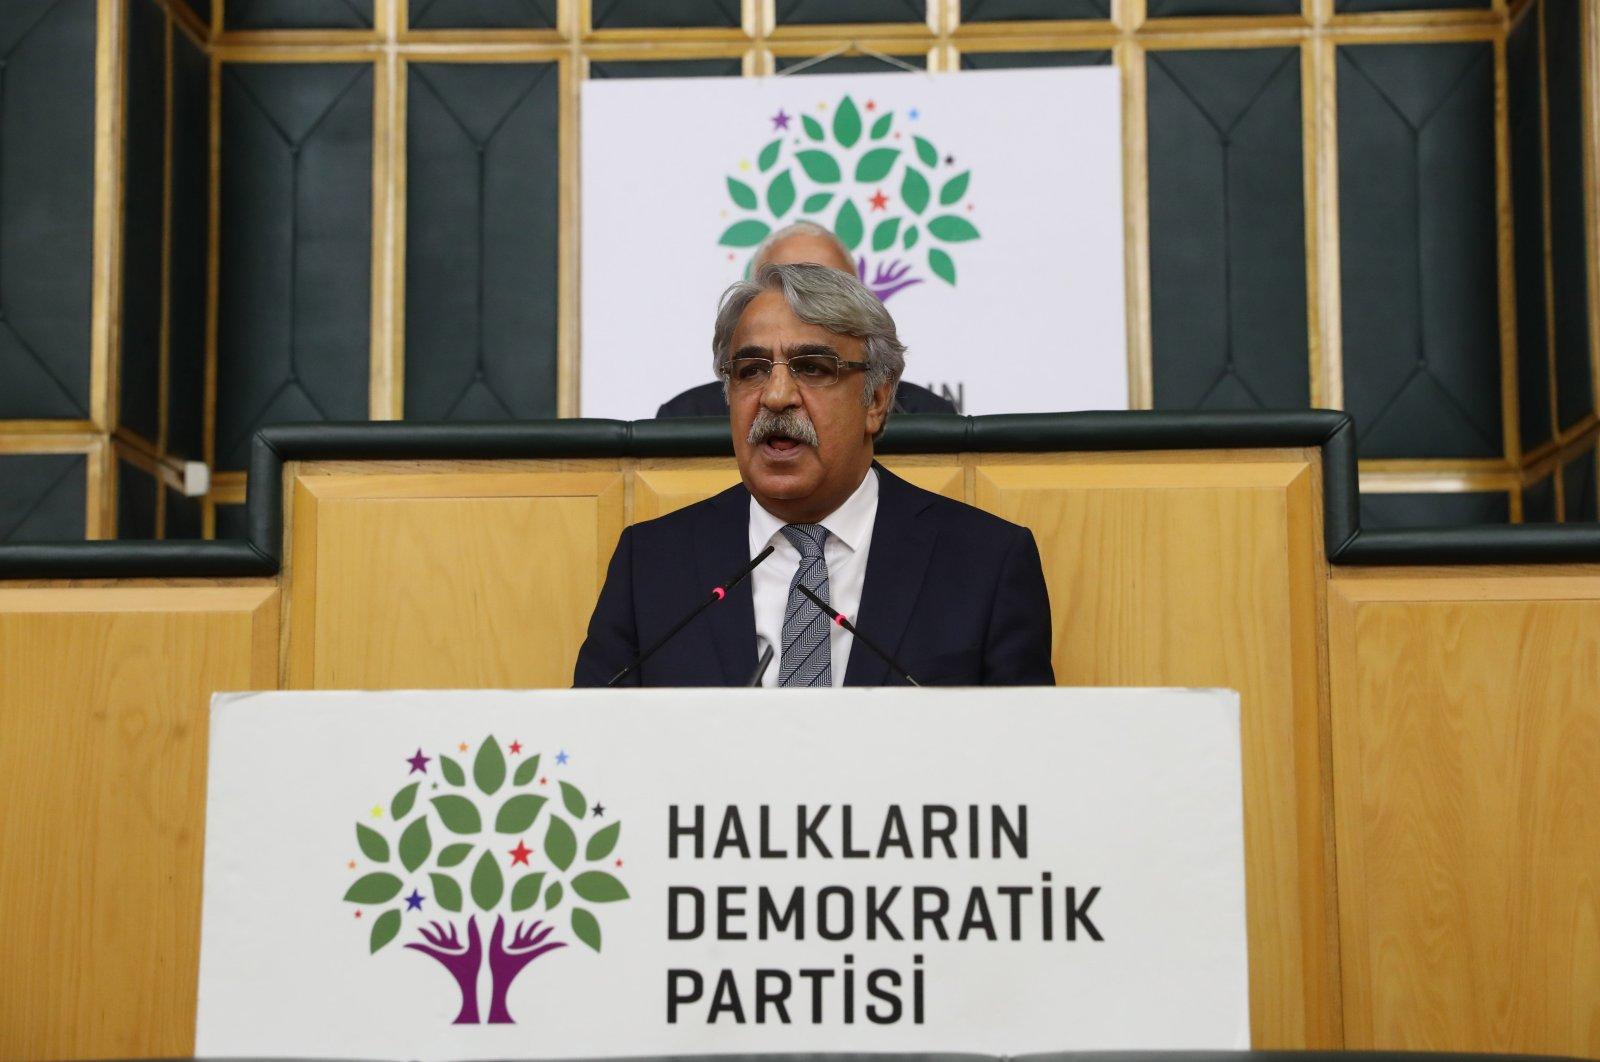 HDP co-Chairperson Mithat Sancar speaks at the Turkish Parliament, Ankara, Turkey, July 21, 2020. (Sabah File Photo)